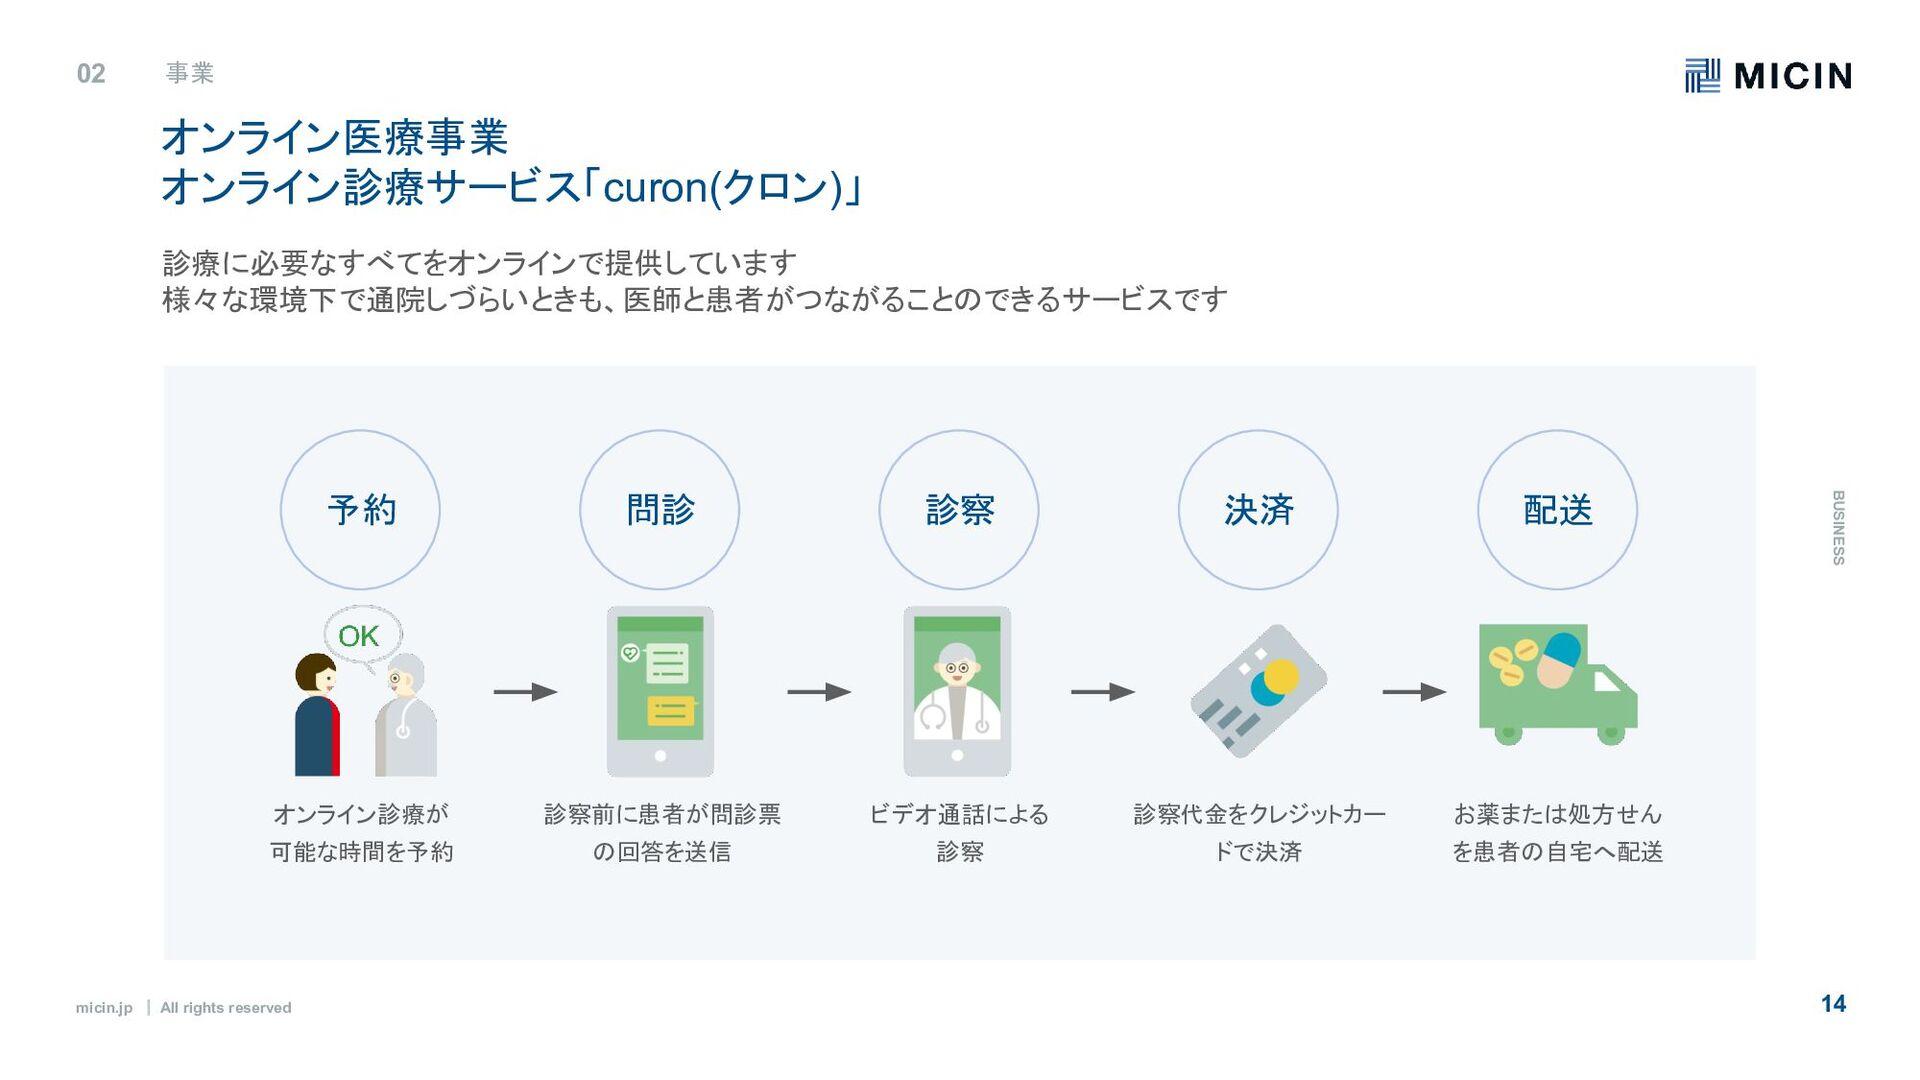 micin.jp ʛ All rights reserved 14 オンライン医療事業 オンラ...